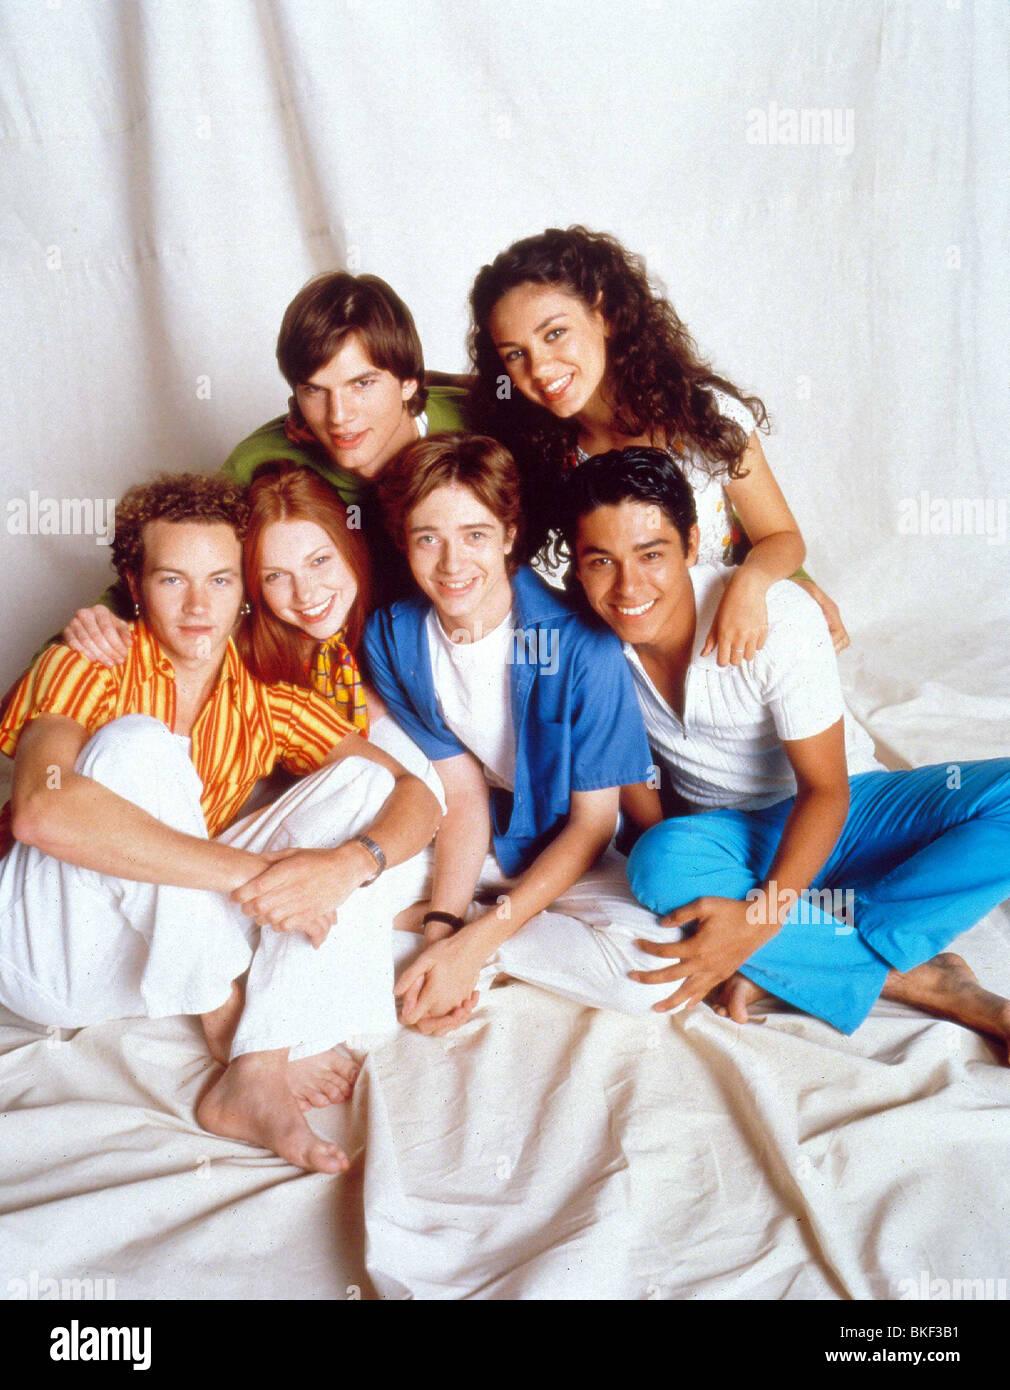 THAT 70'S SHOW (TV - 1998) DANNY MASTERSON, LAURA PREPON, ASHTON KUTCHER, TOPHER GRACE, MILA KUNIS, WILMER VALDERAMA - Stock Image